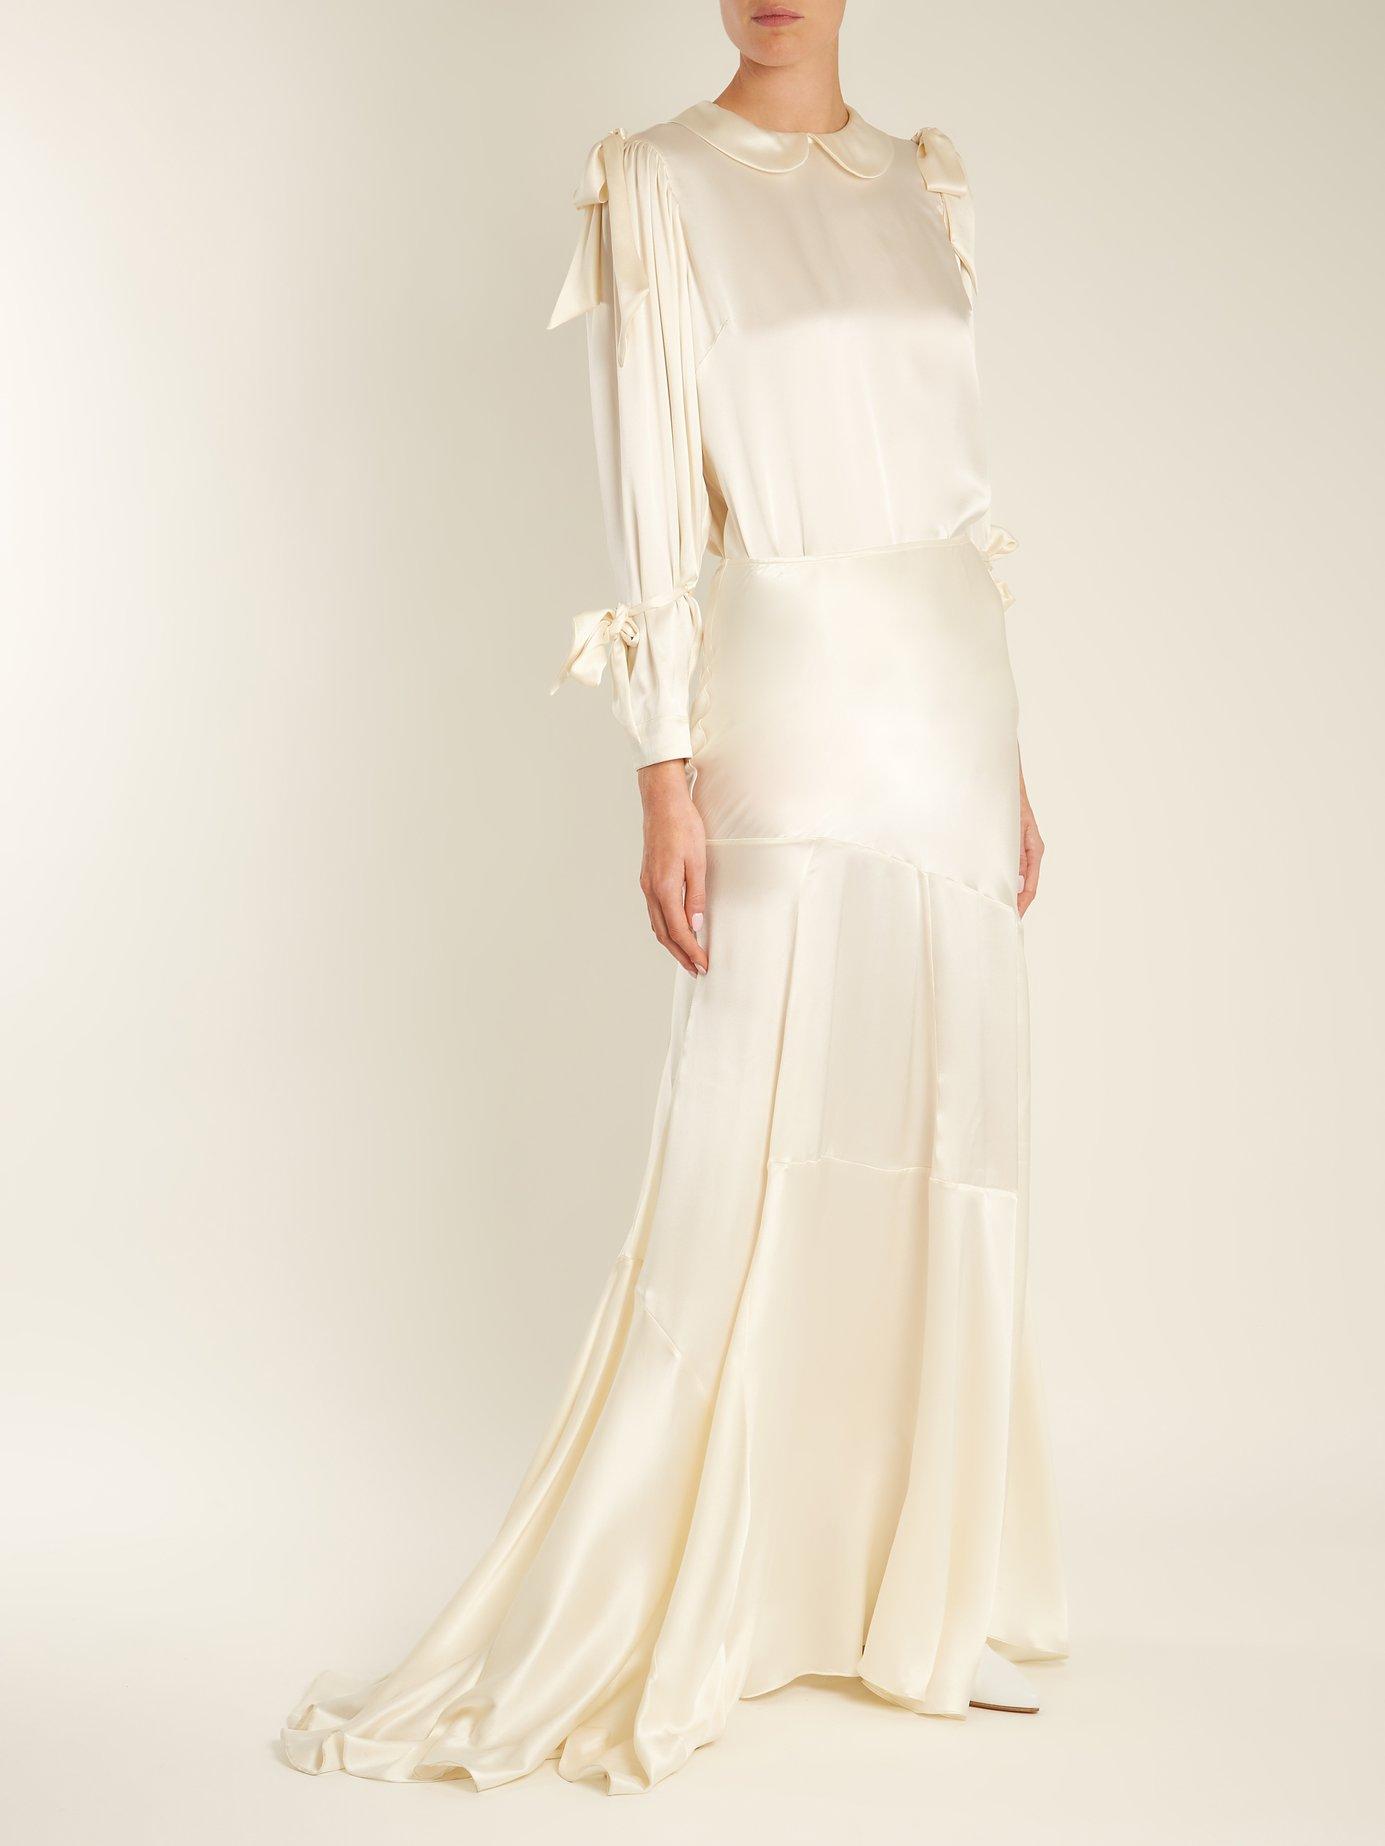 Bow-tied satin blouse by Simone Rocha